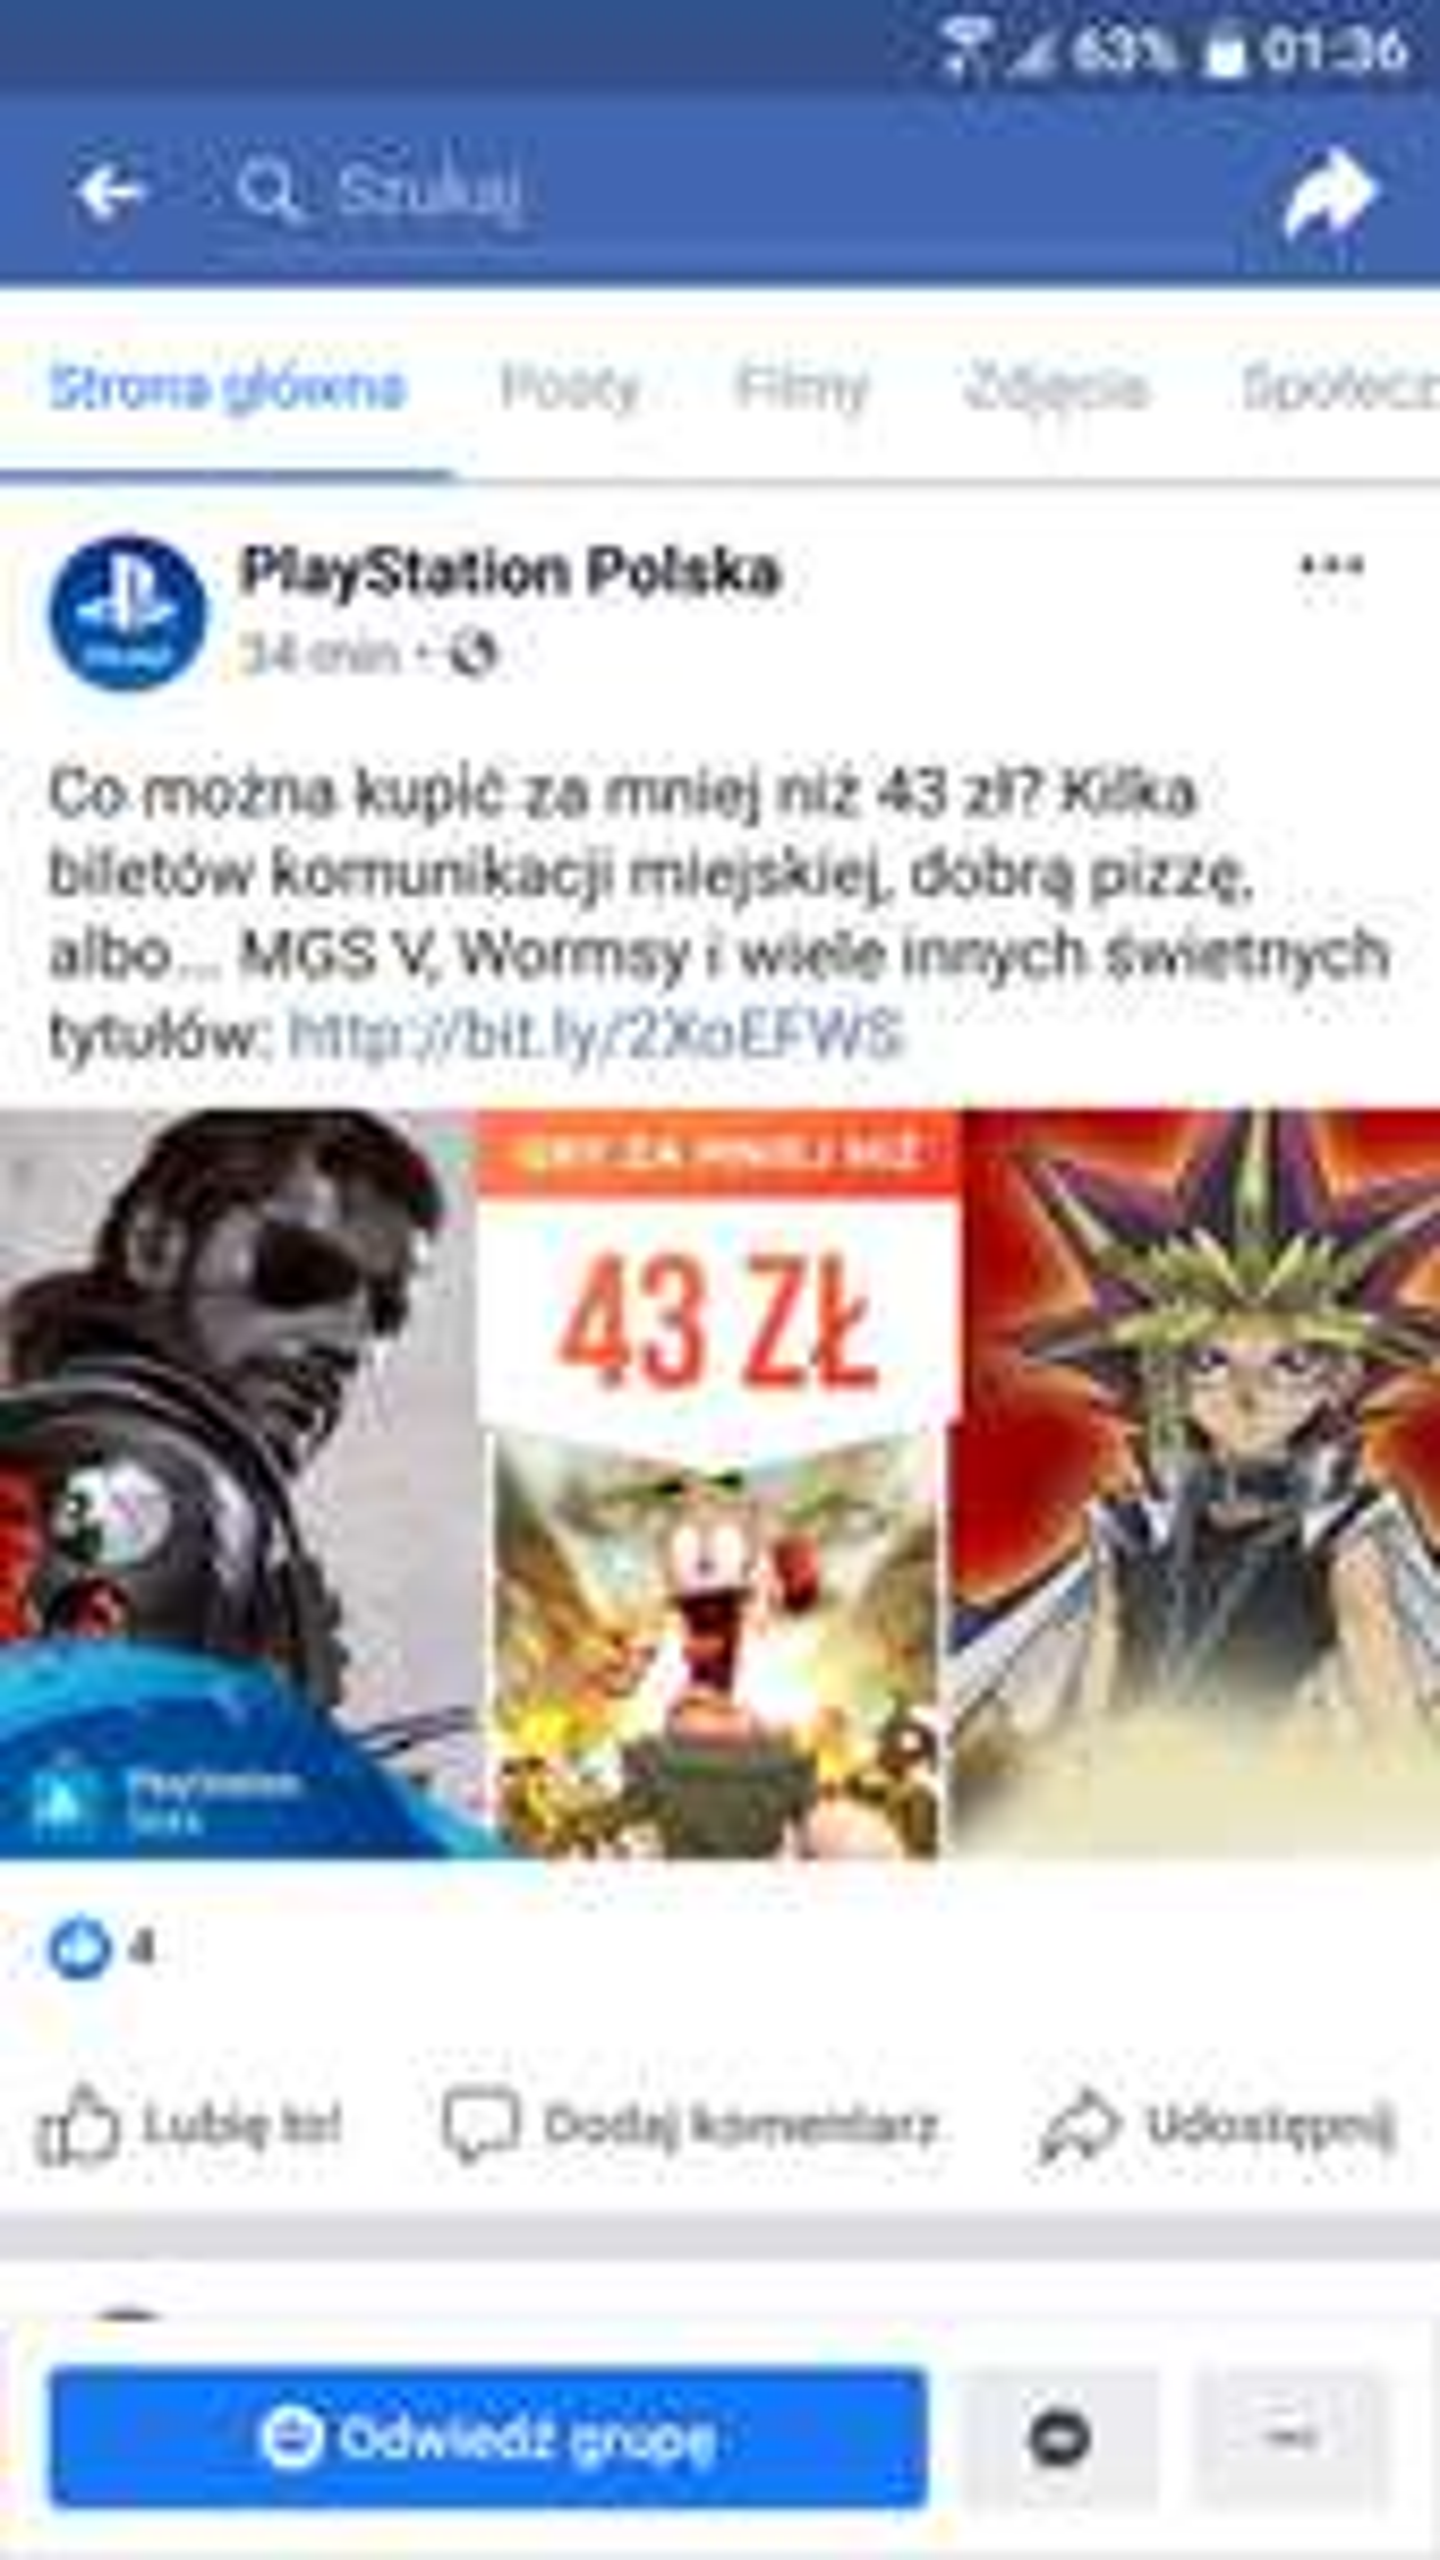 Promocja na gry w PlayStation Store. Heavy Rain, Beyond:Two Souls i inne.